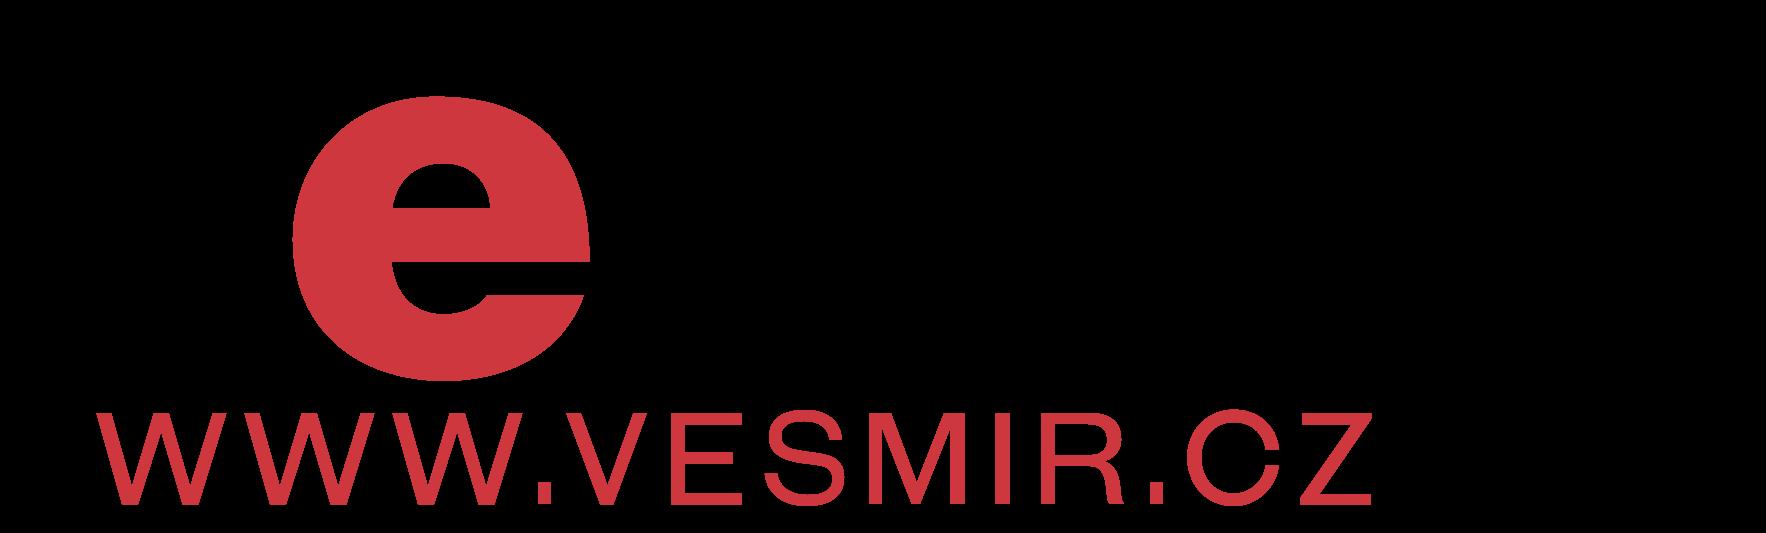 vesmir_logo_webcervena_sazba_www